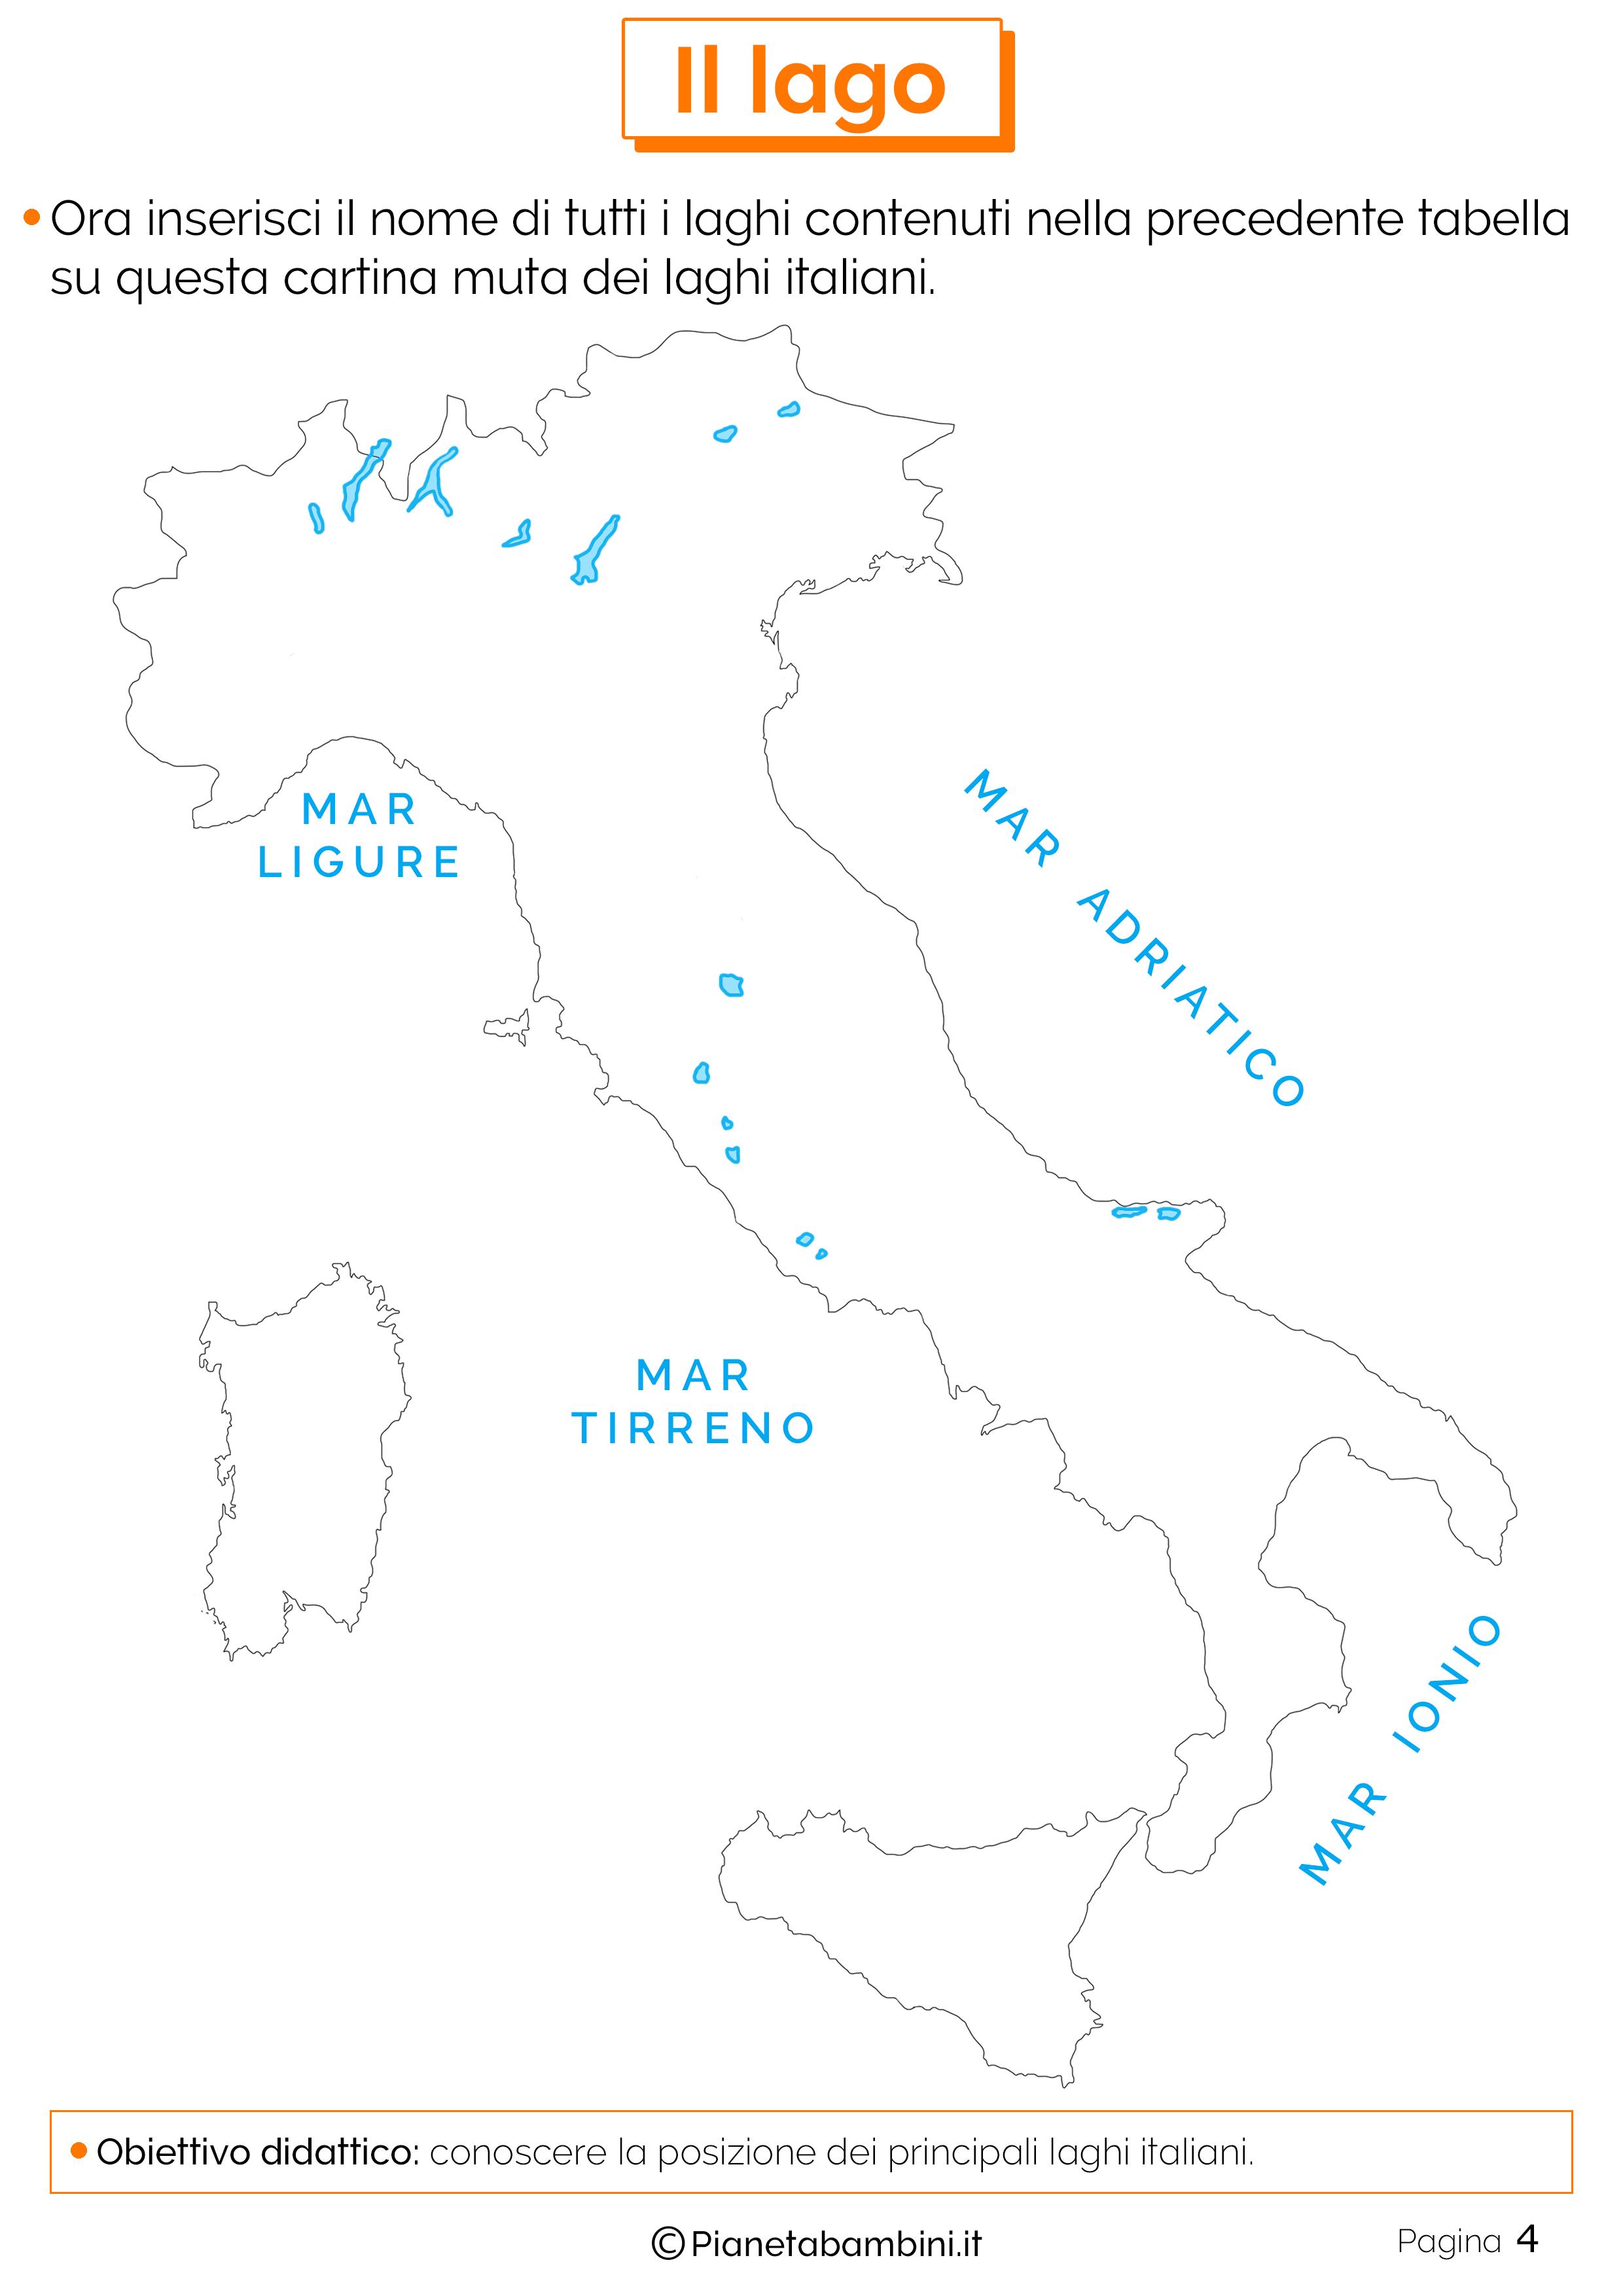 Cartina muta dei laghi italiani